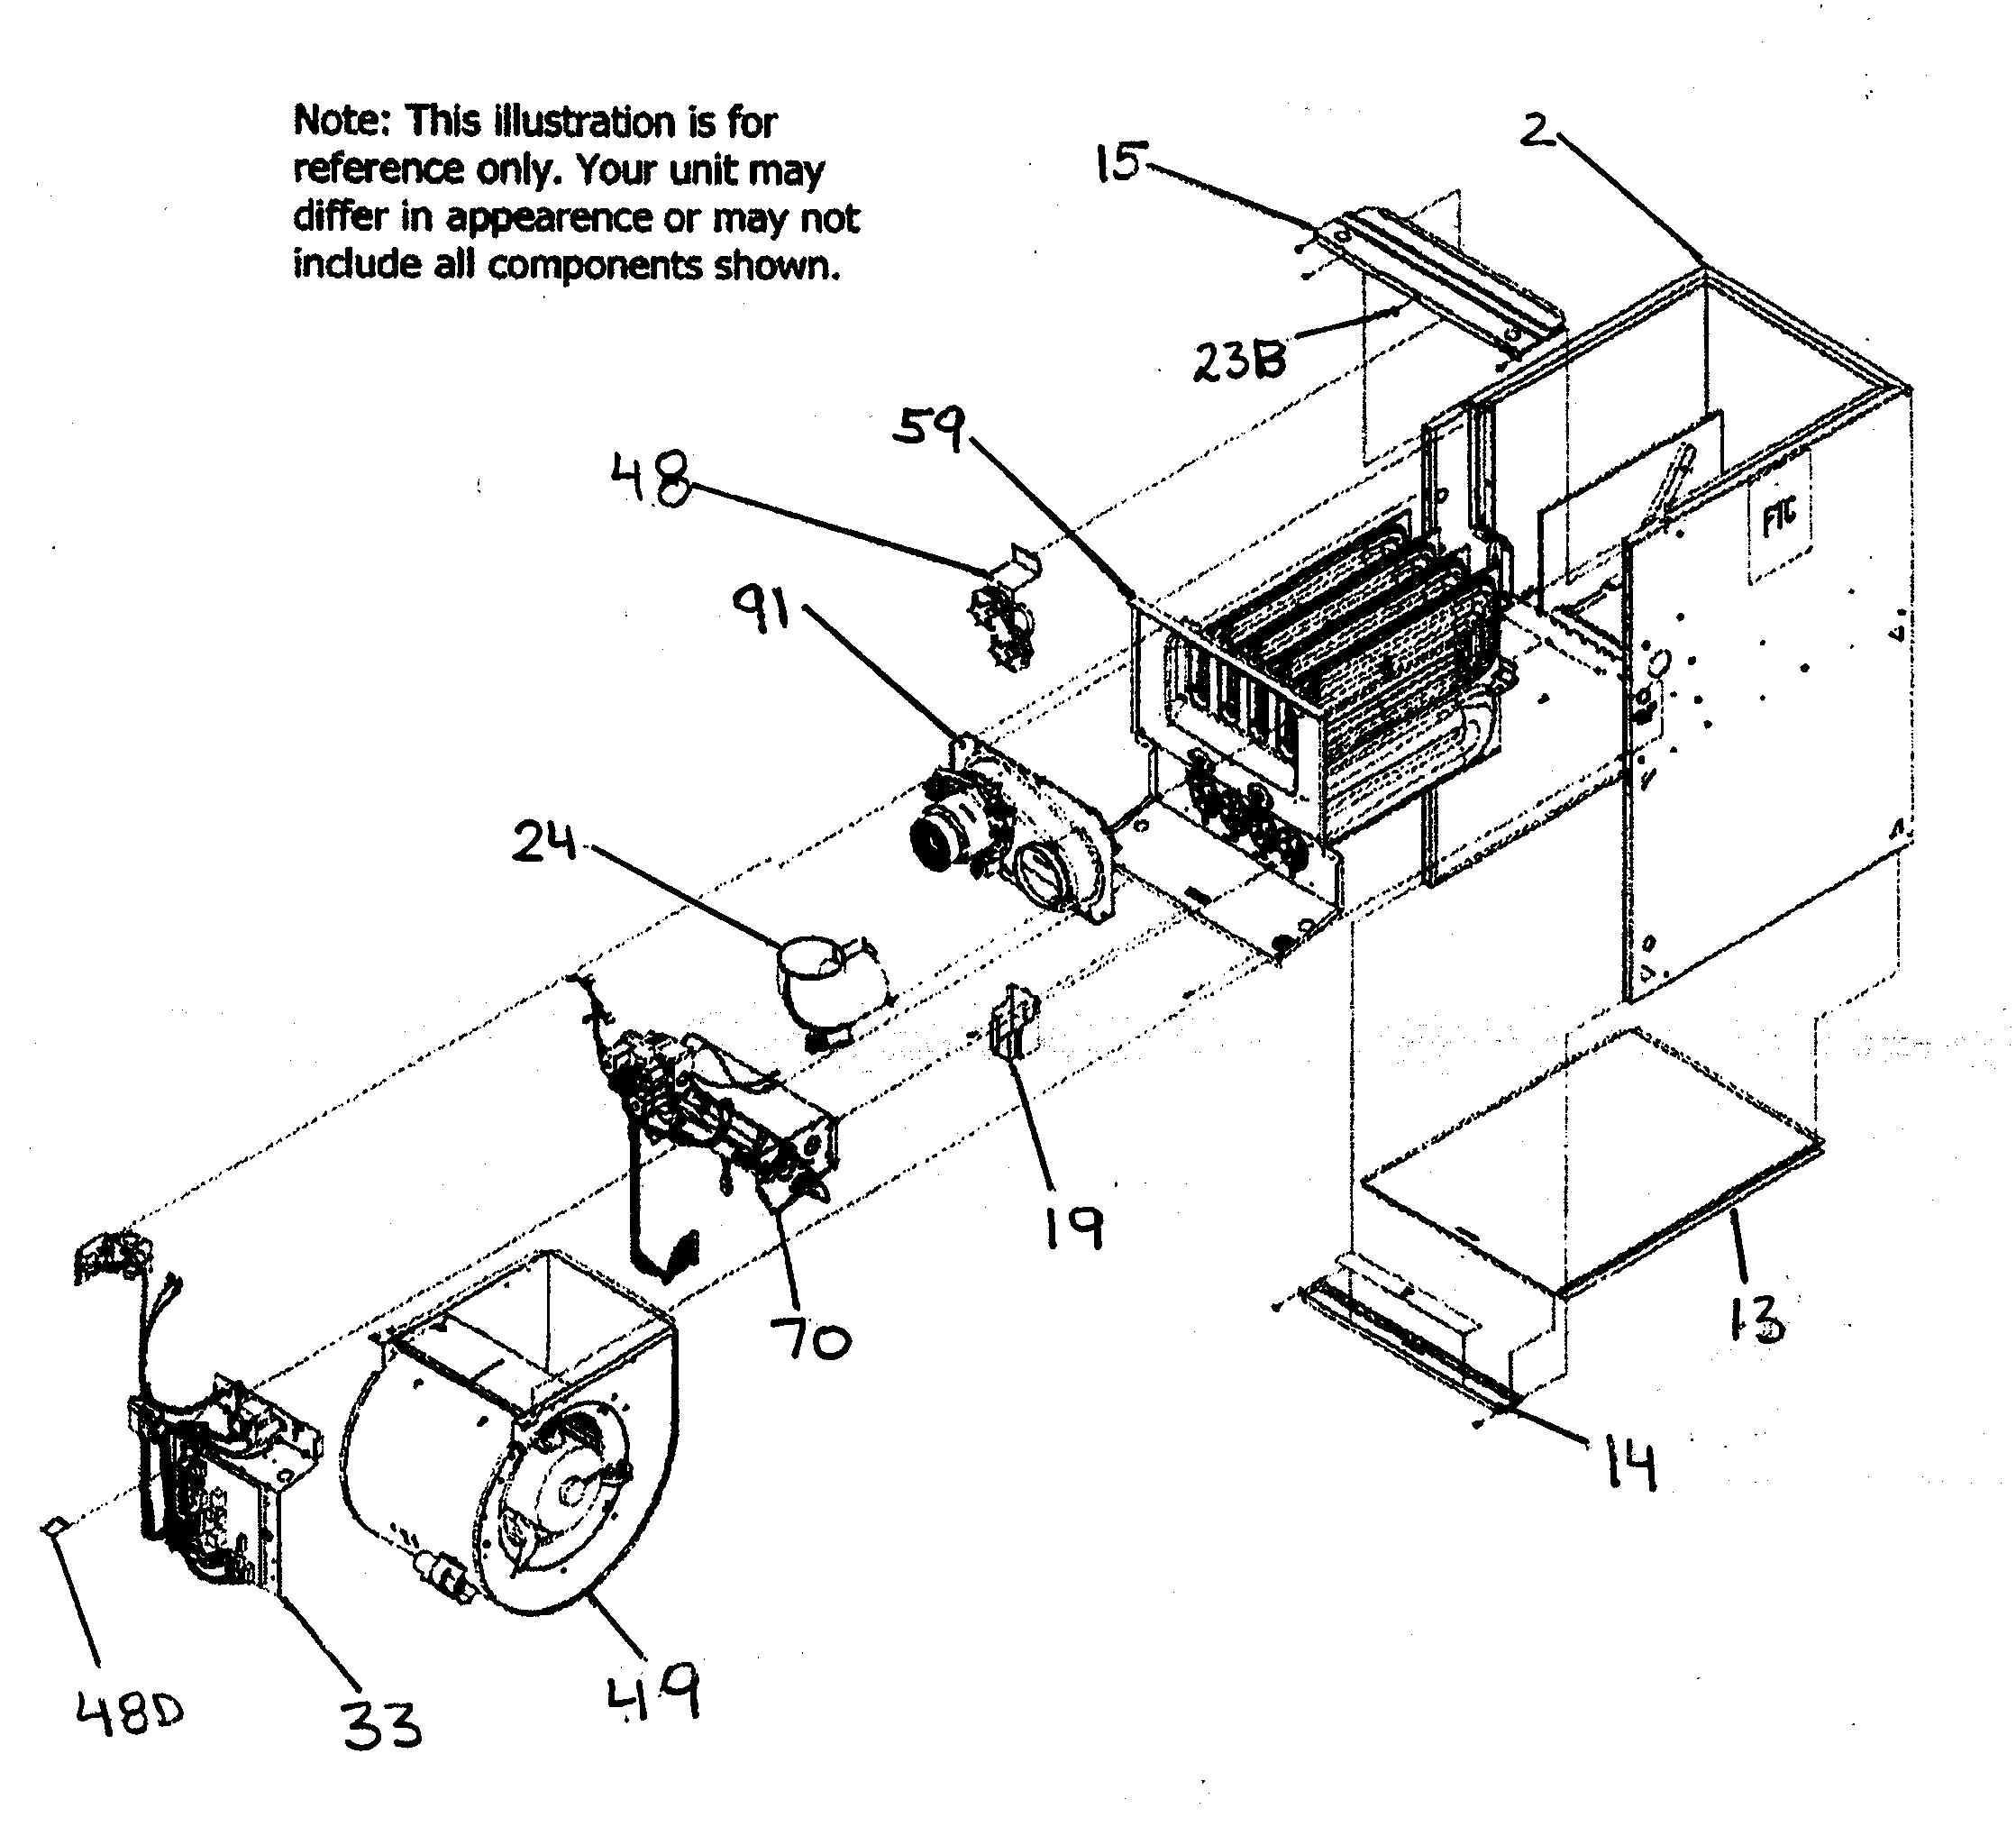 Goodman heat pump package unit wiring diagram annavernon wiring diagram